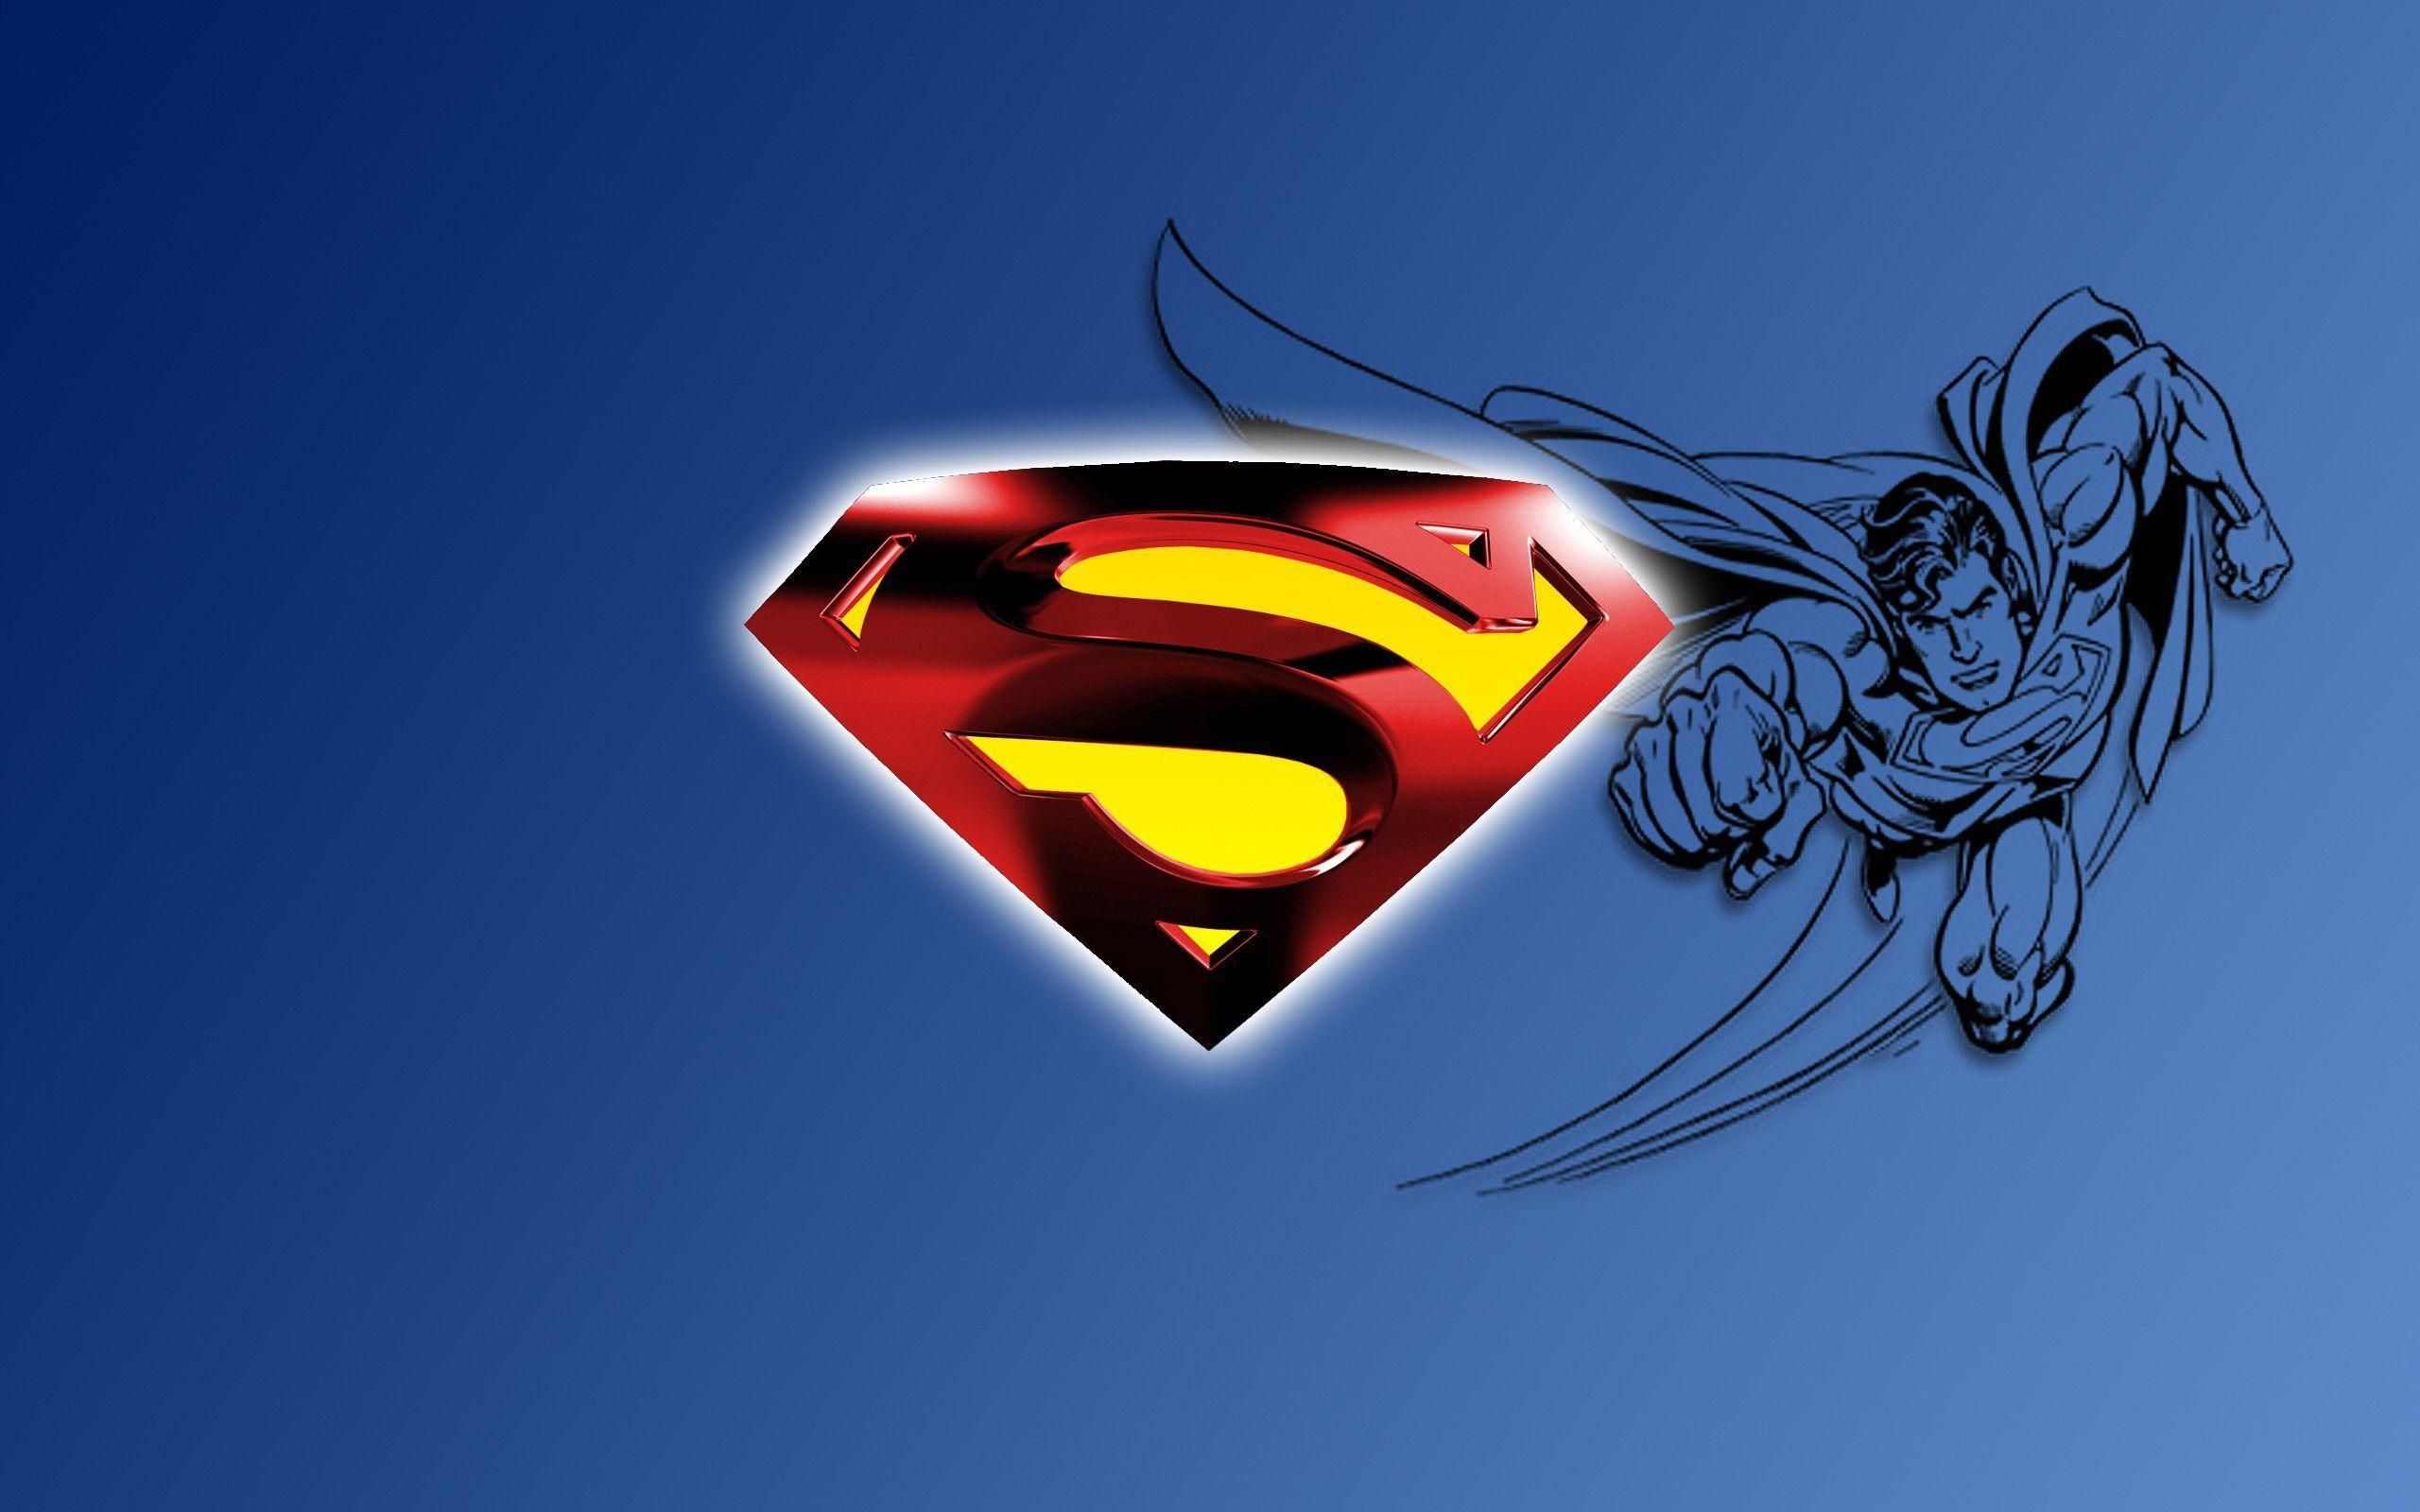 Superman Wallpaper Hd For Desktop 3313